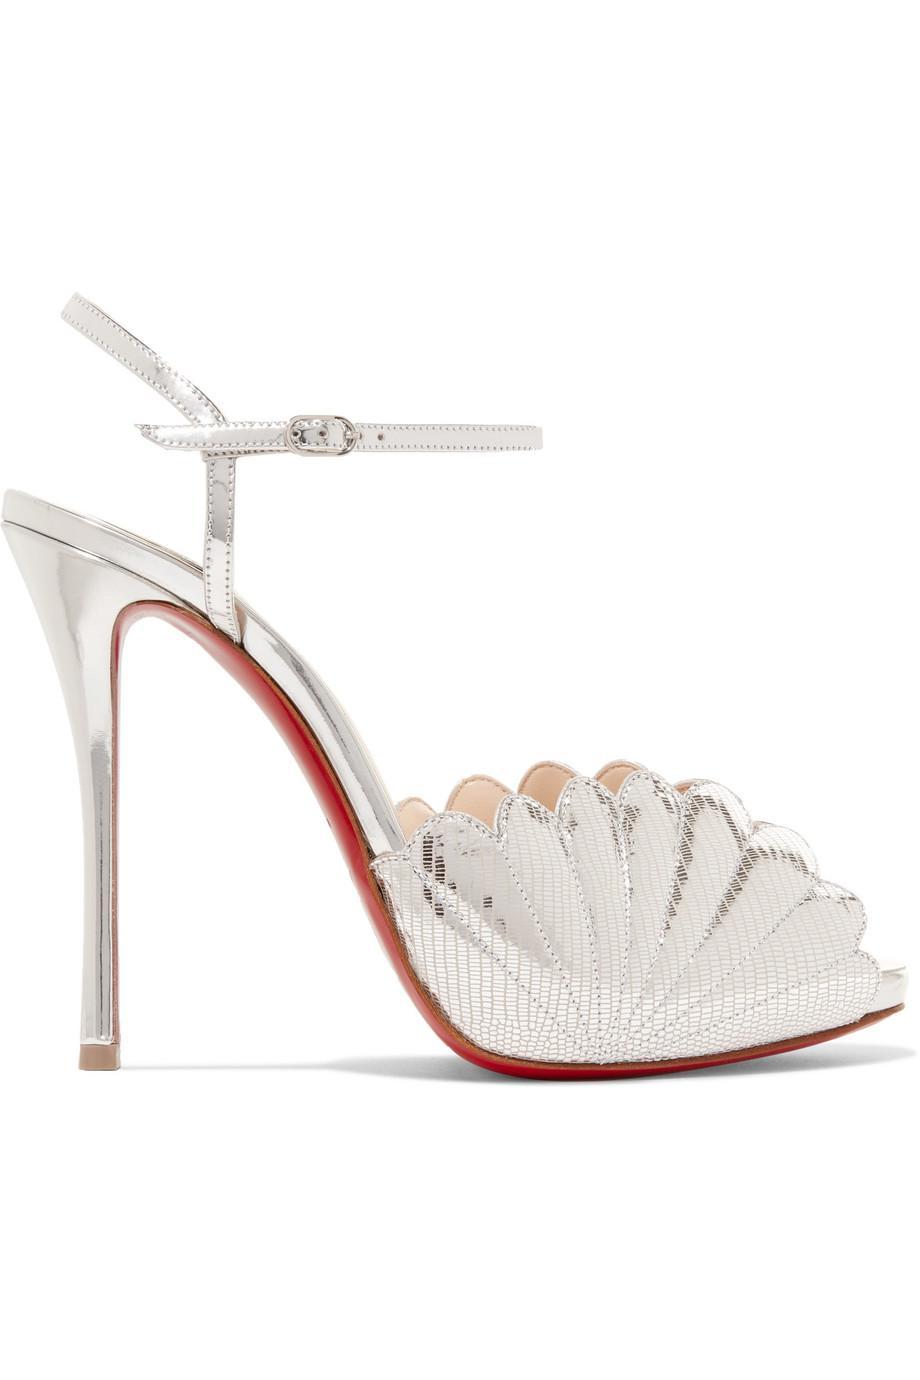 Botticella 120 Metallic Lizard-effect Leather Sandals - Silver Christian Louboutin 3U1J94K1